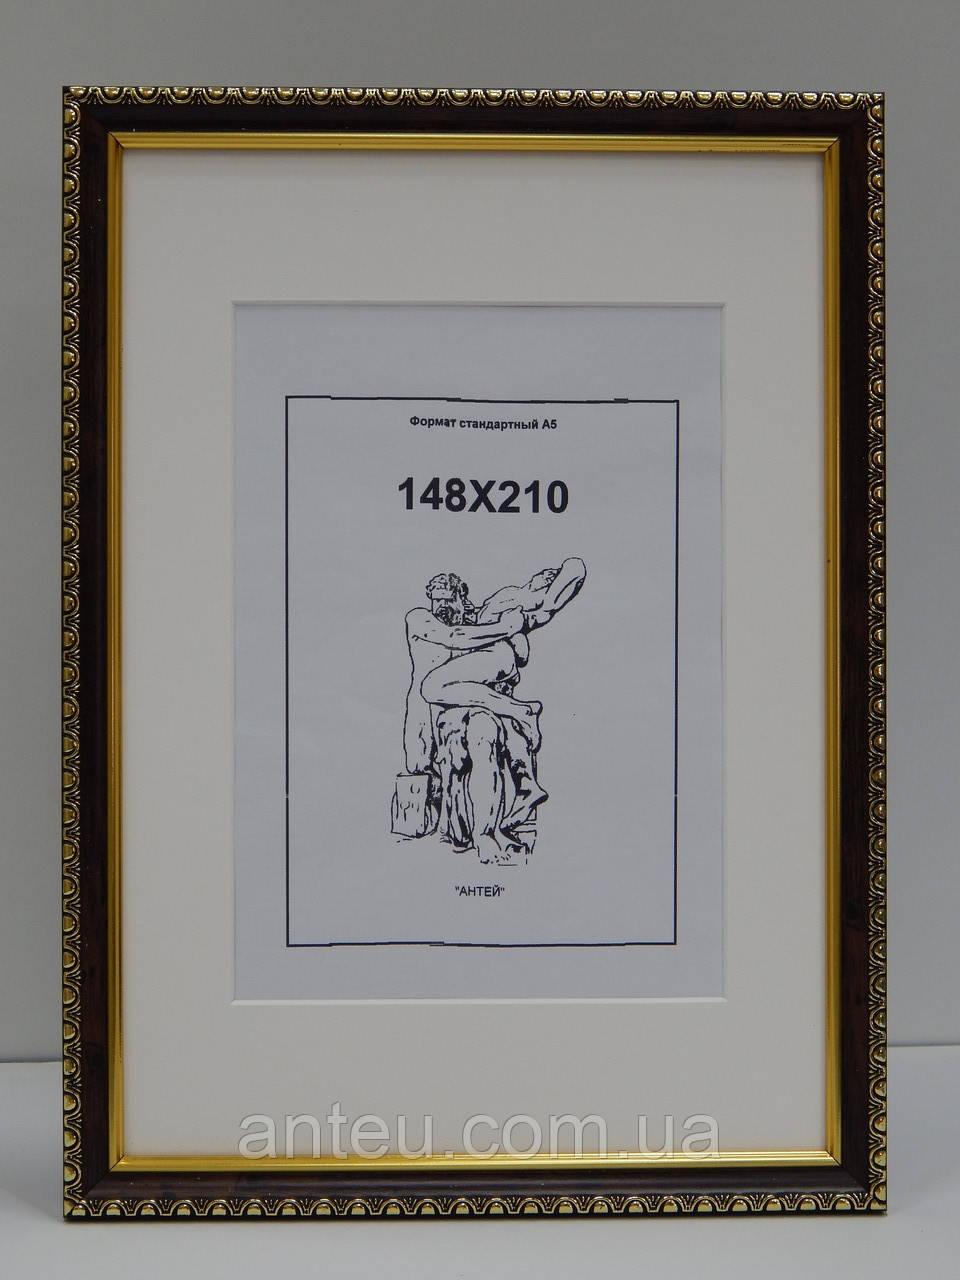 Рамка стандартная А4 (210х297)С паспарту окно А5, фото 1